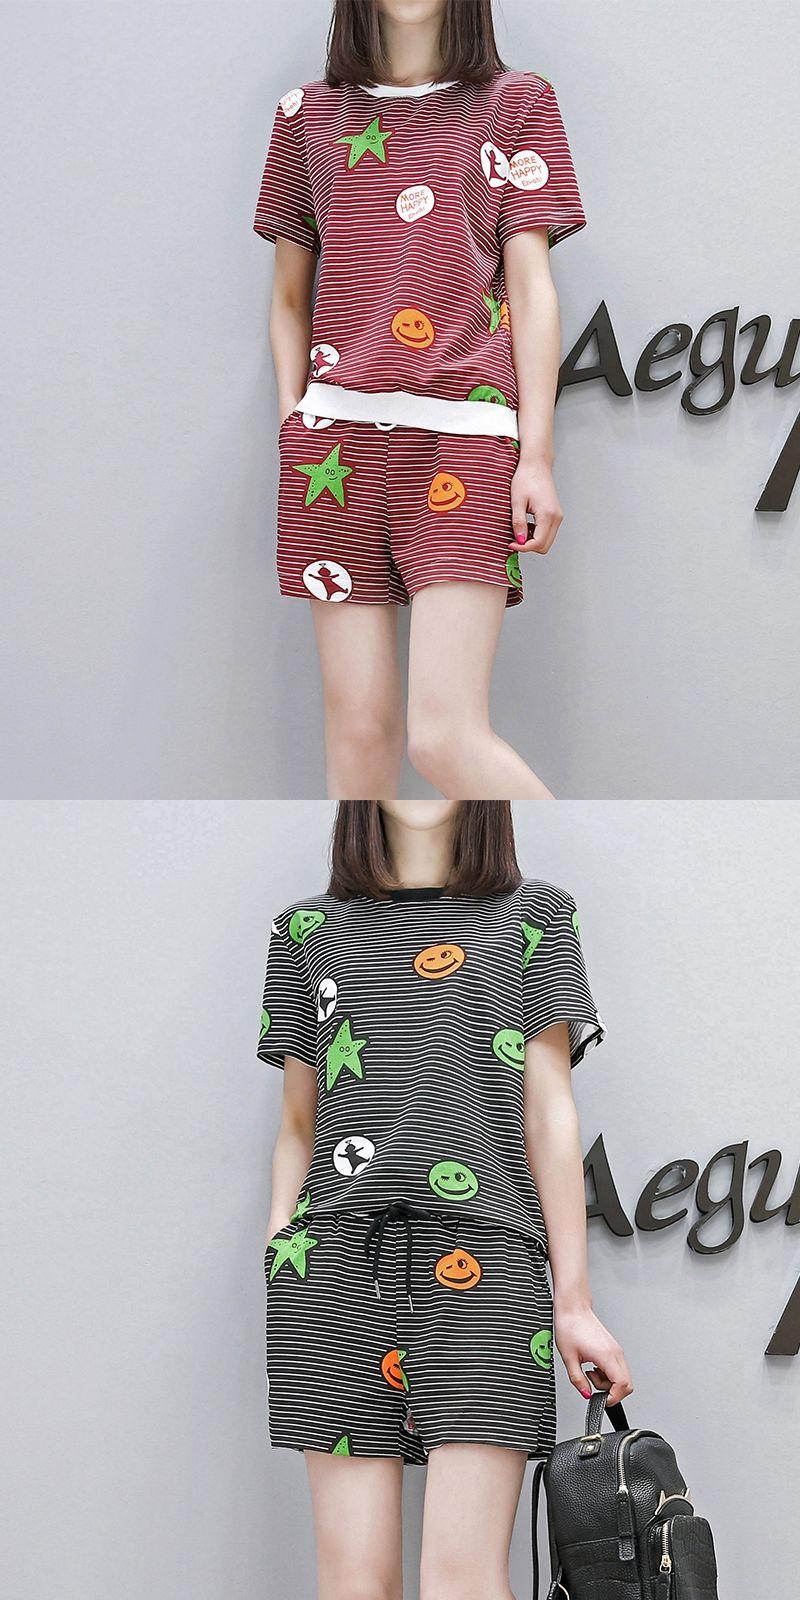 5a37e1688a3 Plus Size Women European Fashion Suits Shorts Set Clothing 2017 Summer  Loose Two-Piece Short